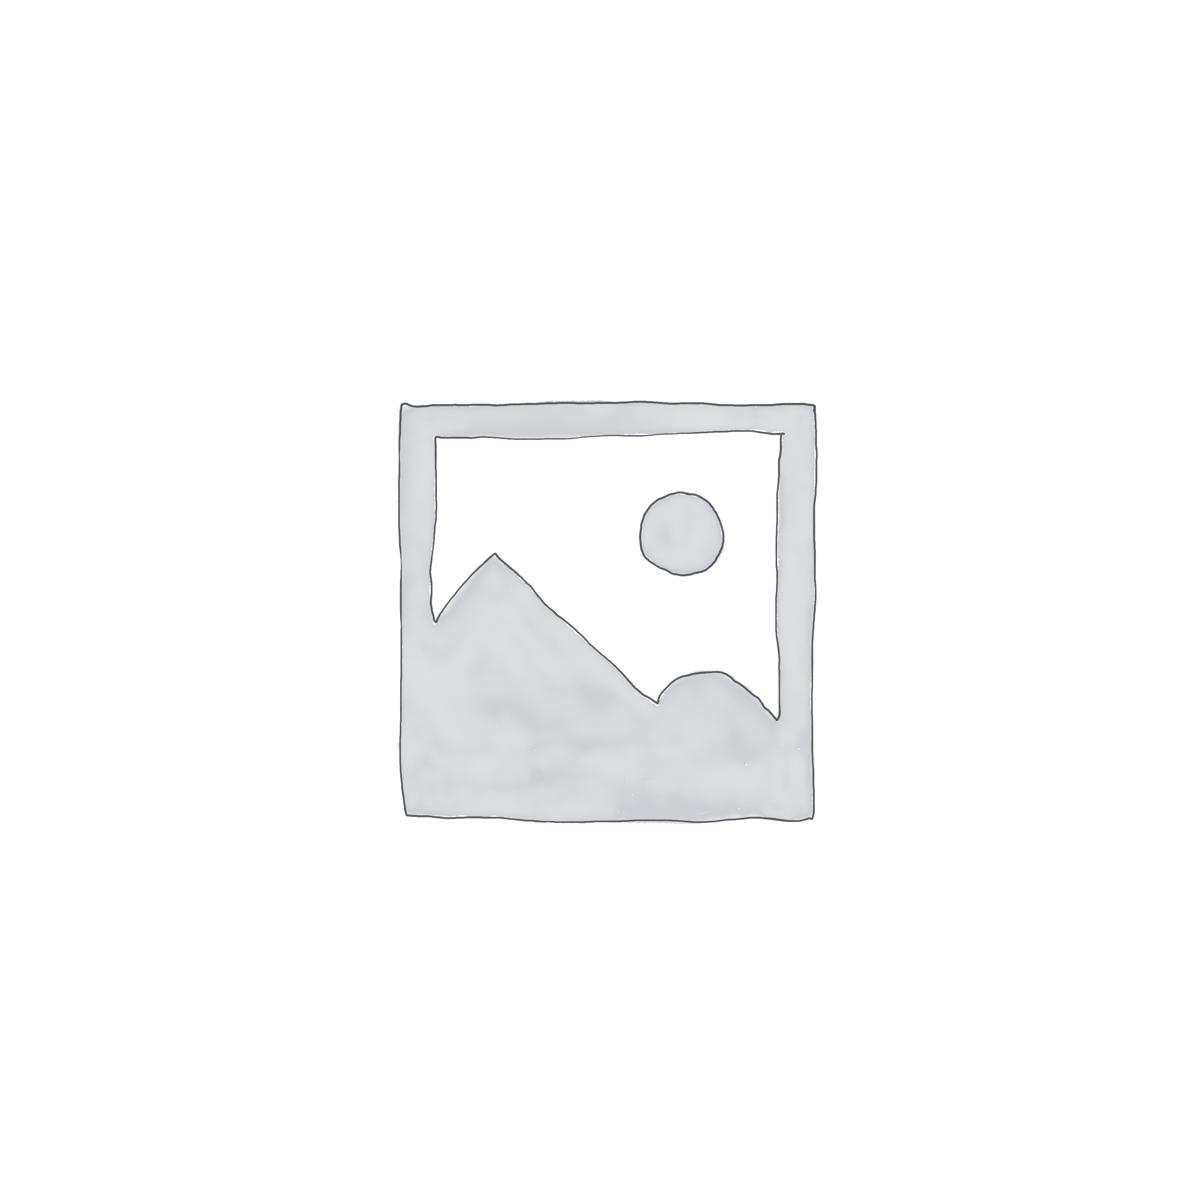 Vintage Charcoal World Map Wallpaper Mural